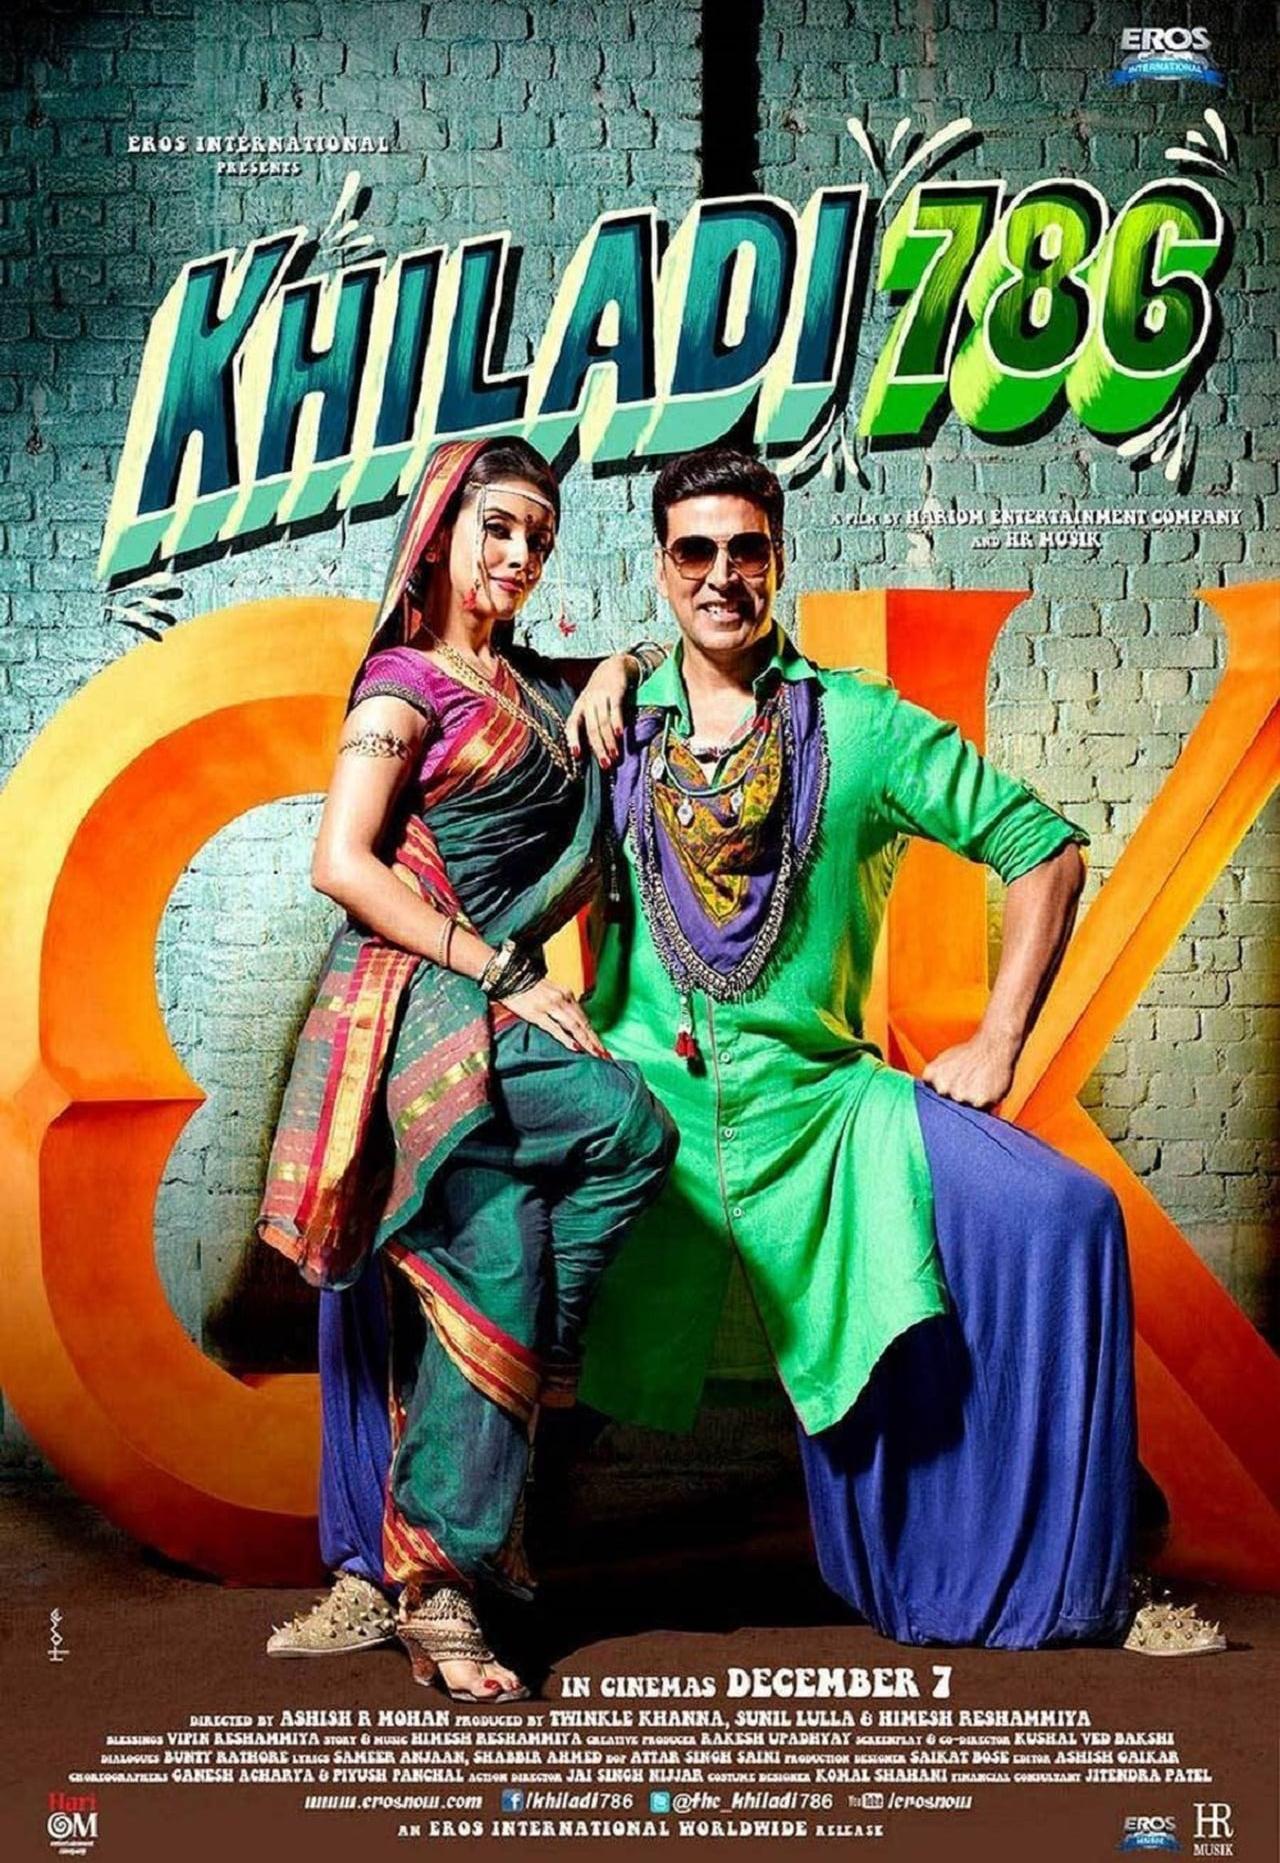 Khiladi 786 (2012) [ 4K ] UHD Video Songs x265 DTS-HD 5.1 – AC3 5.1 – | DB9 |